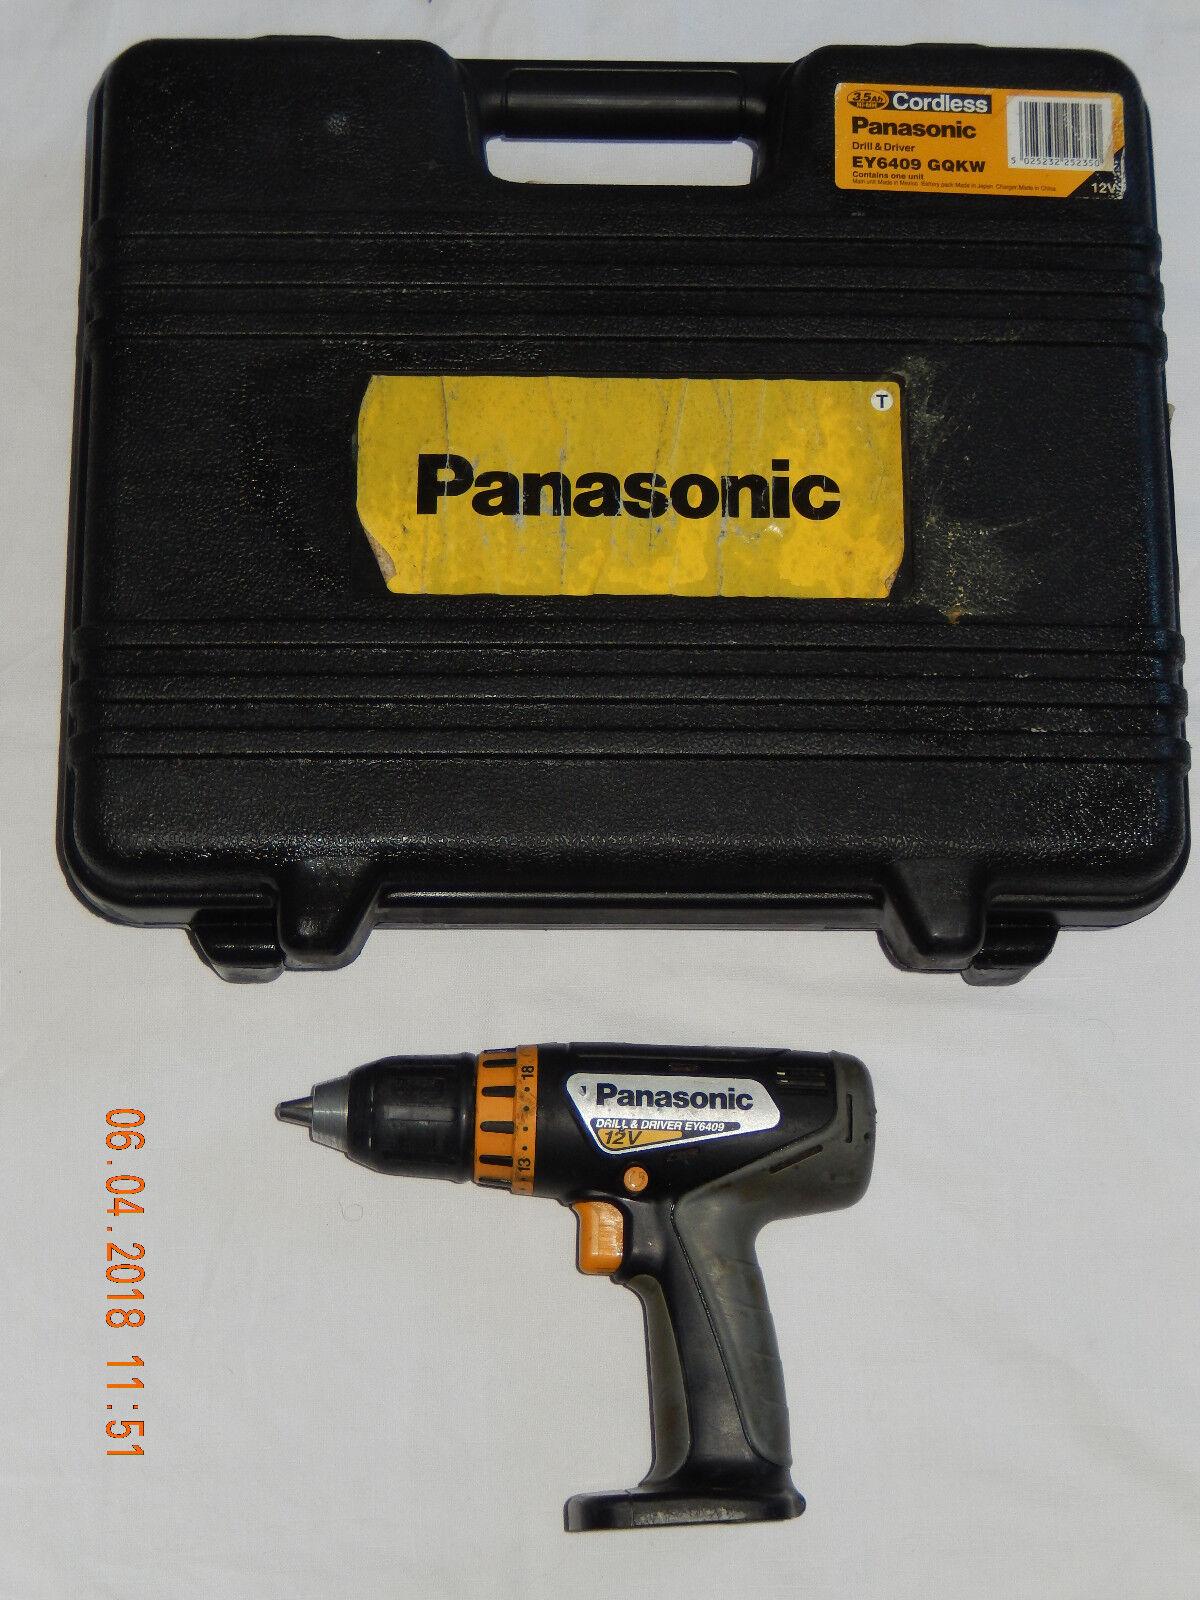 PANASONIC EY6409 GQKW 12V PROFI-Akkuschrauber ,100% OK+Koffer